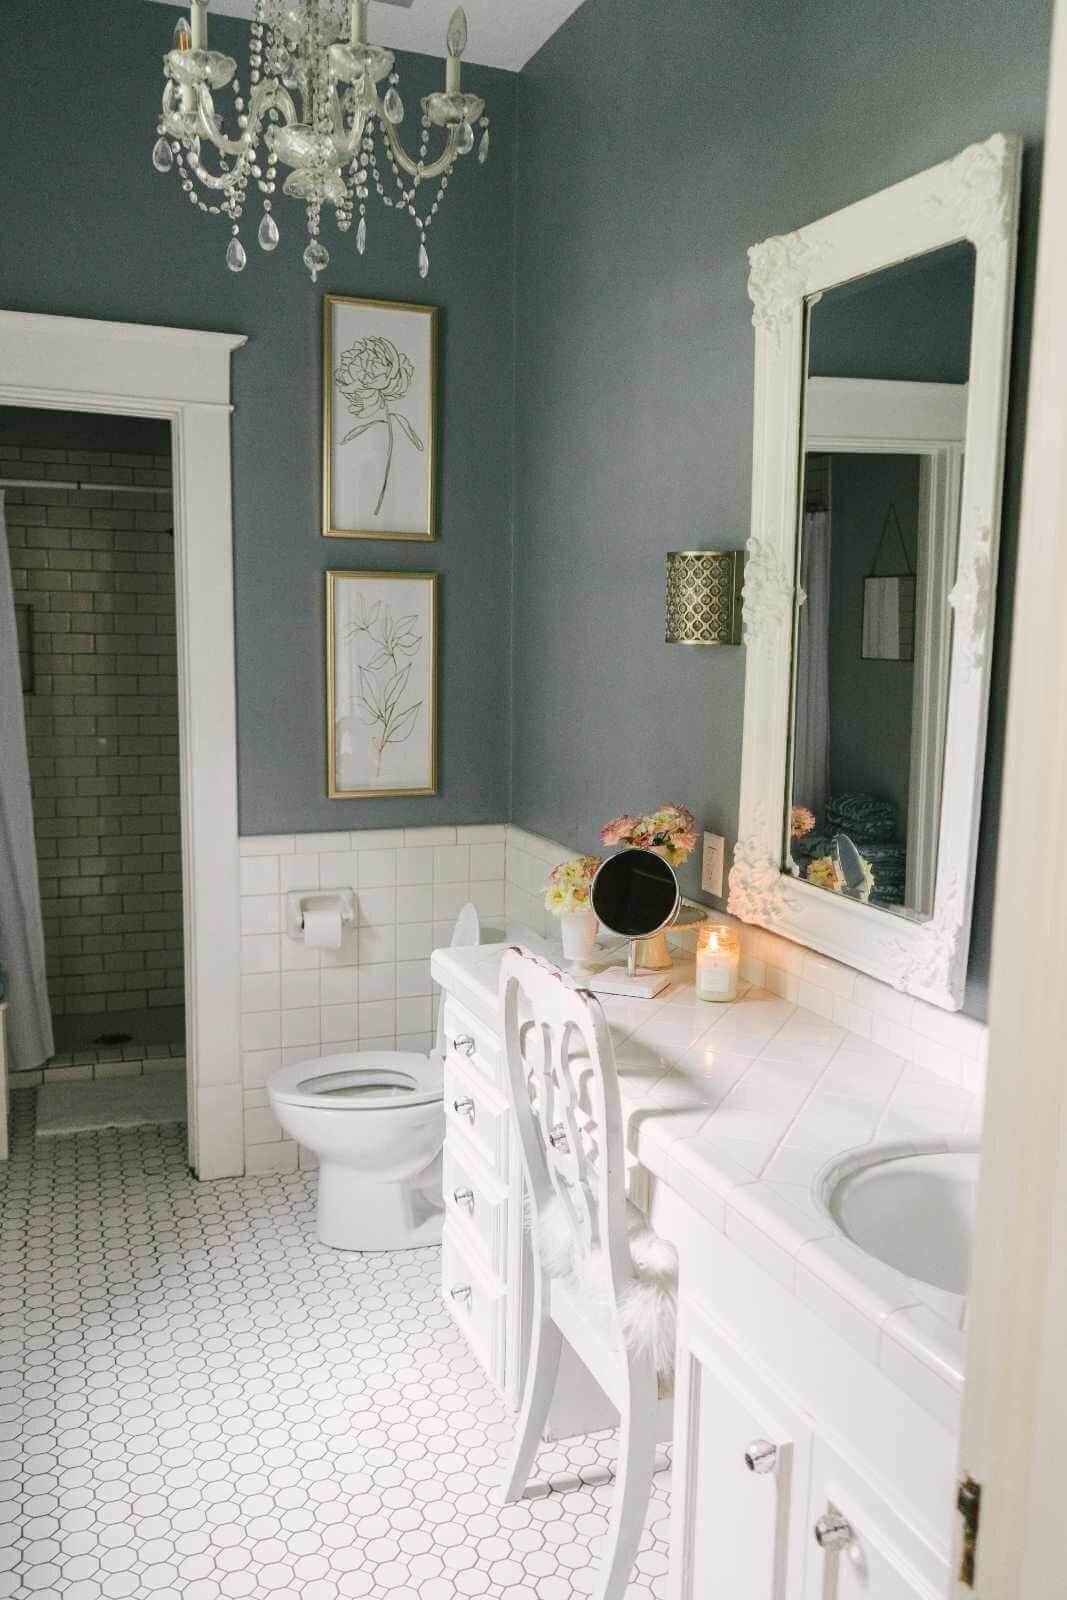 Thistlewood Farms Home Tour-有110年历史、风格优雅的农舍-浅蓝色浴室1.jpg